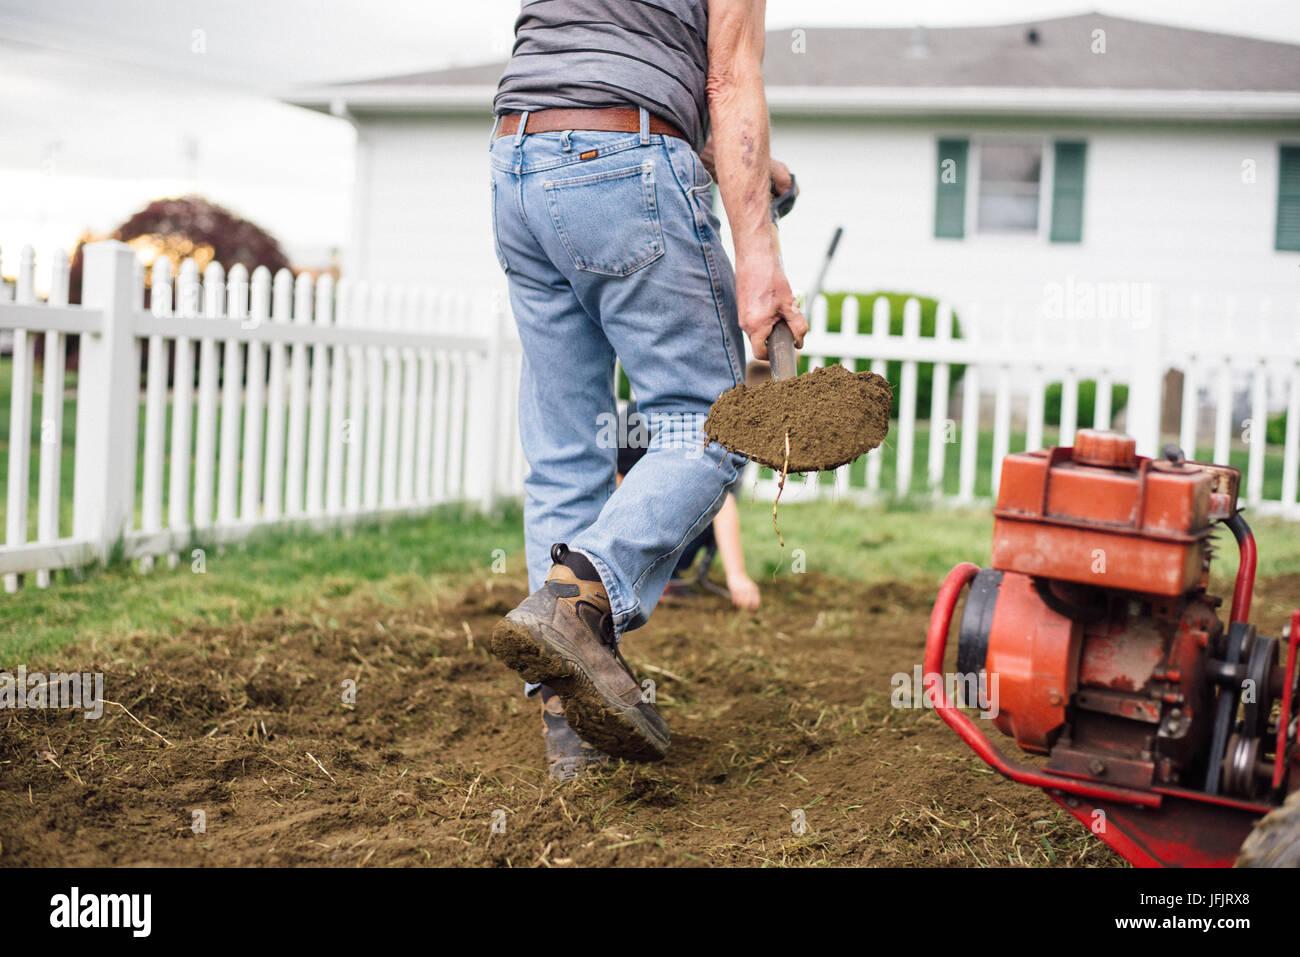 A man carries a shovel full of dirt in a garden - Stock Image